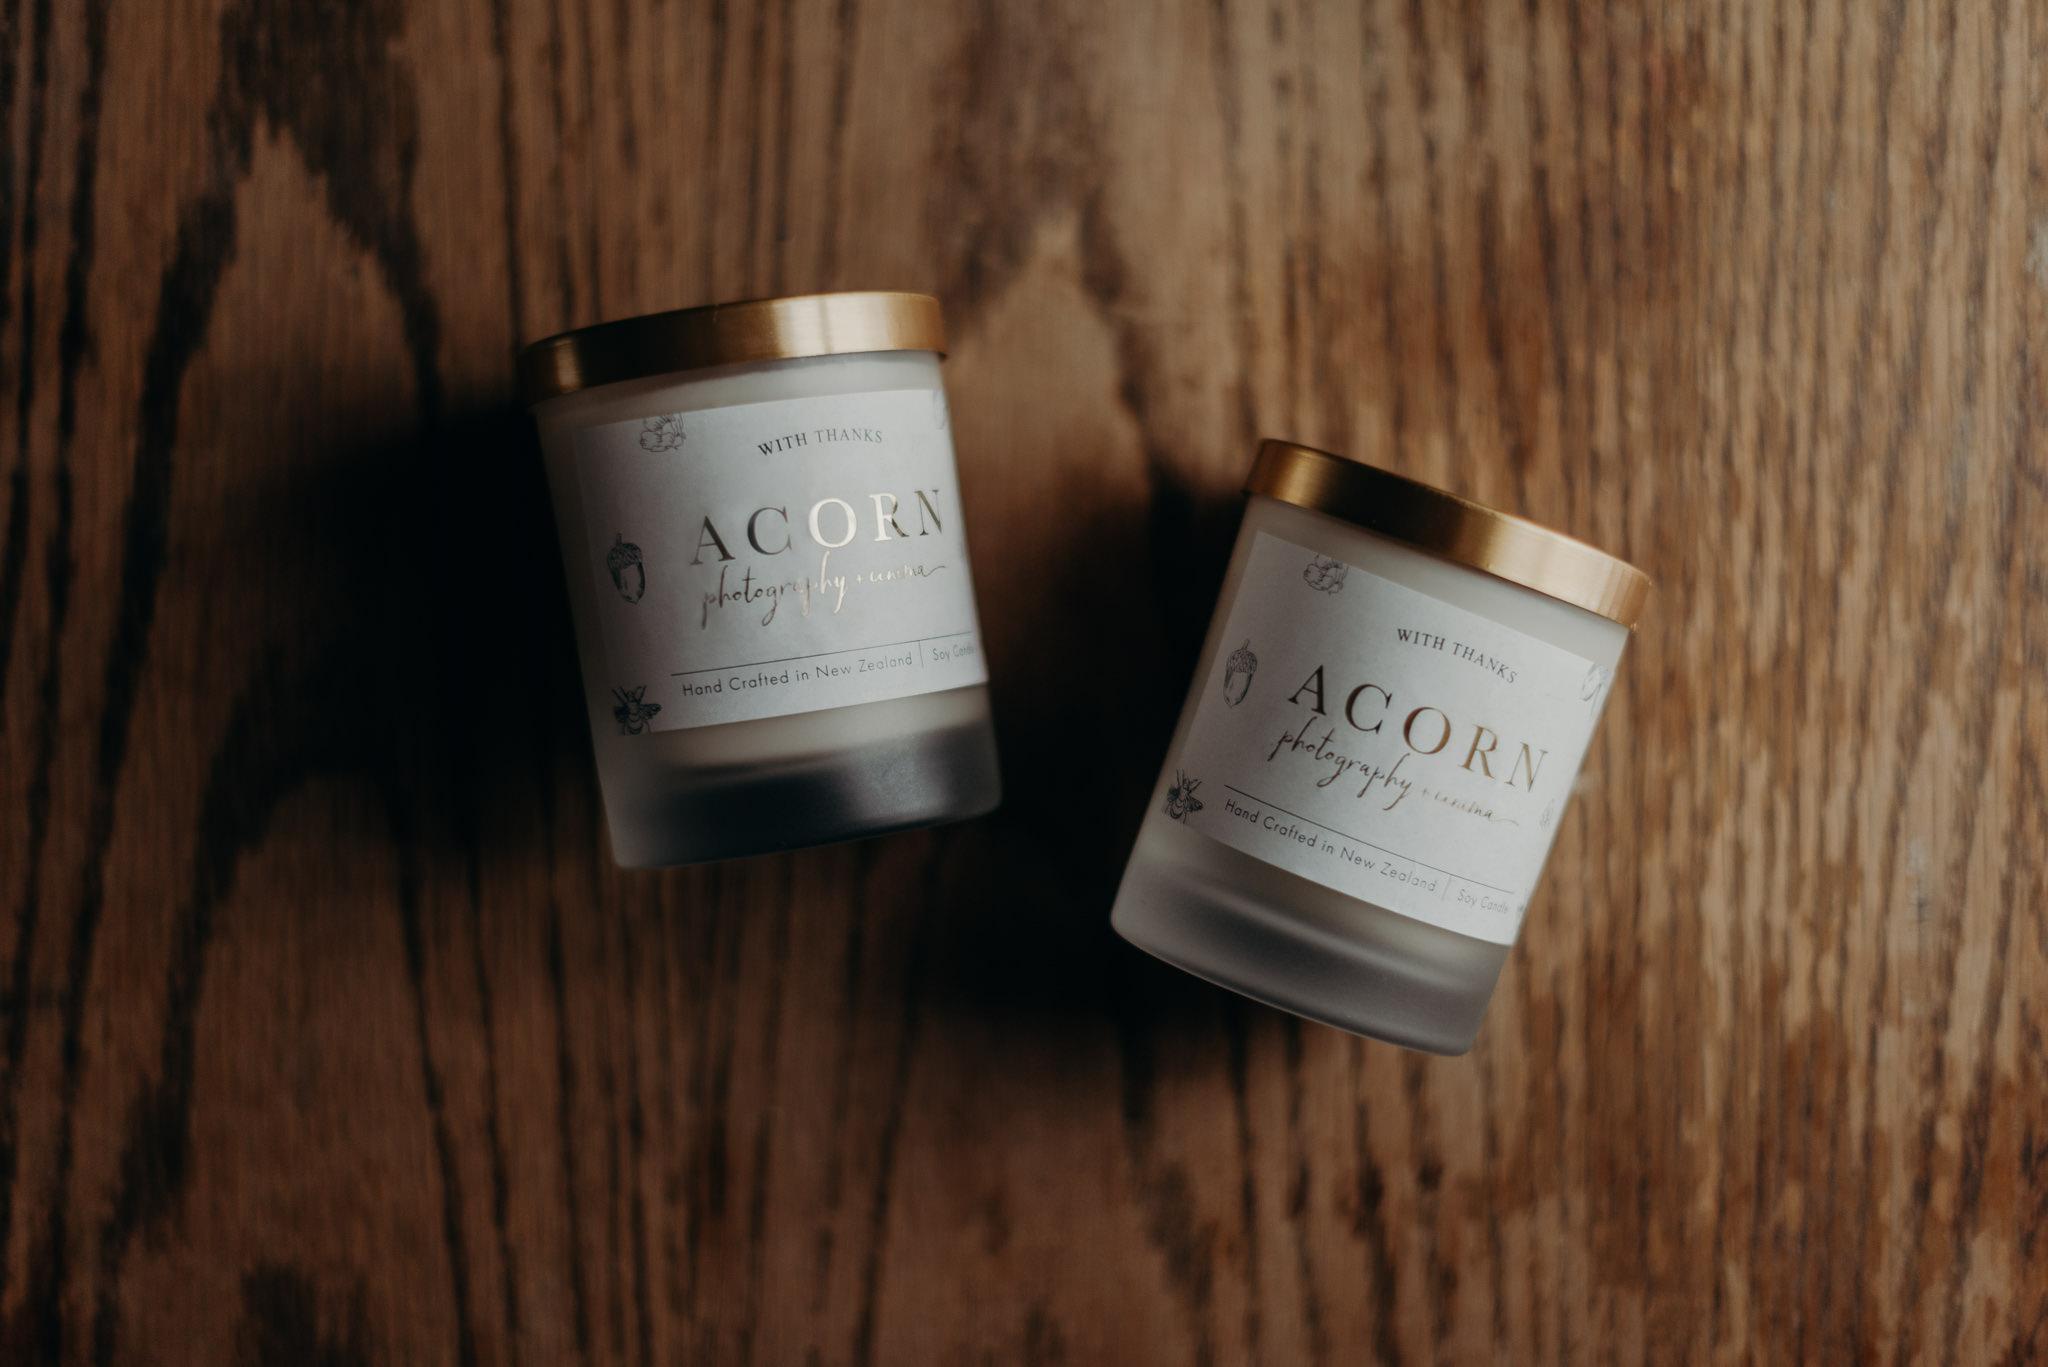 Handmade+soy+candles+-+Acorn+Photography+&+Cinema+Branding+and+packaging.+New+Zealand+Wedding+Photographer._-6.jpeg